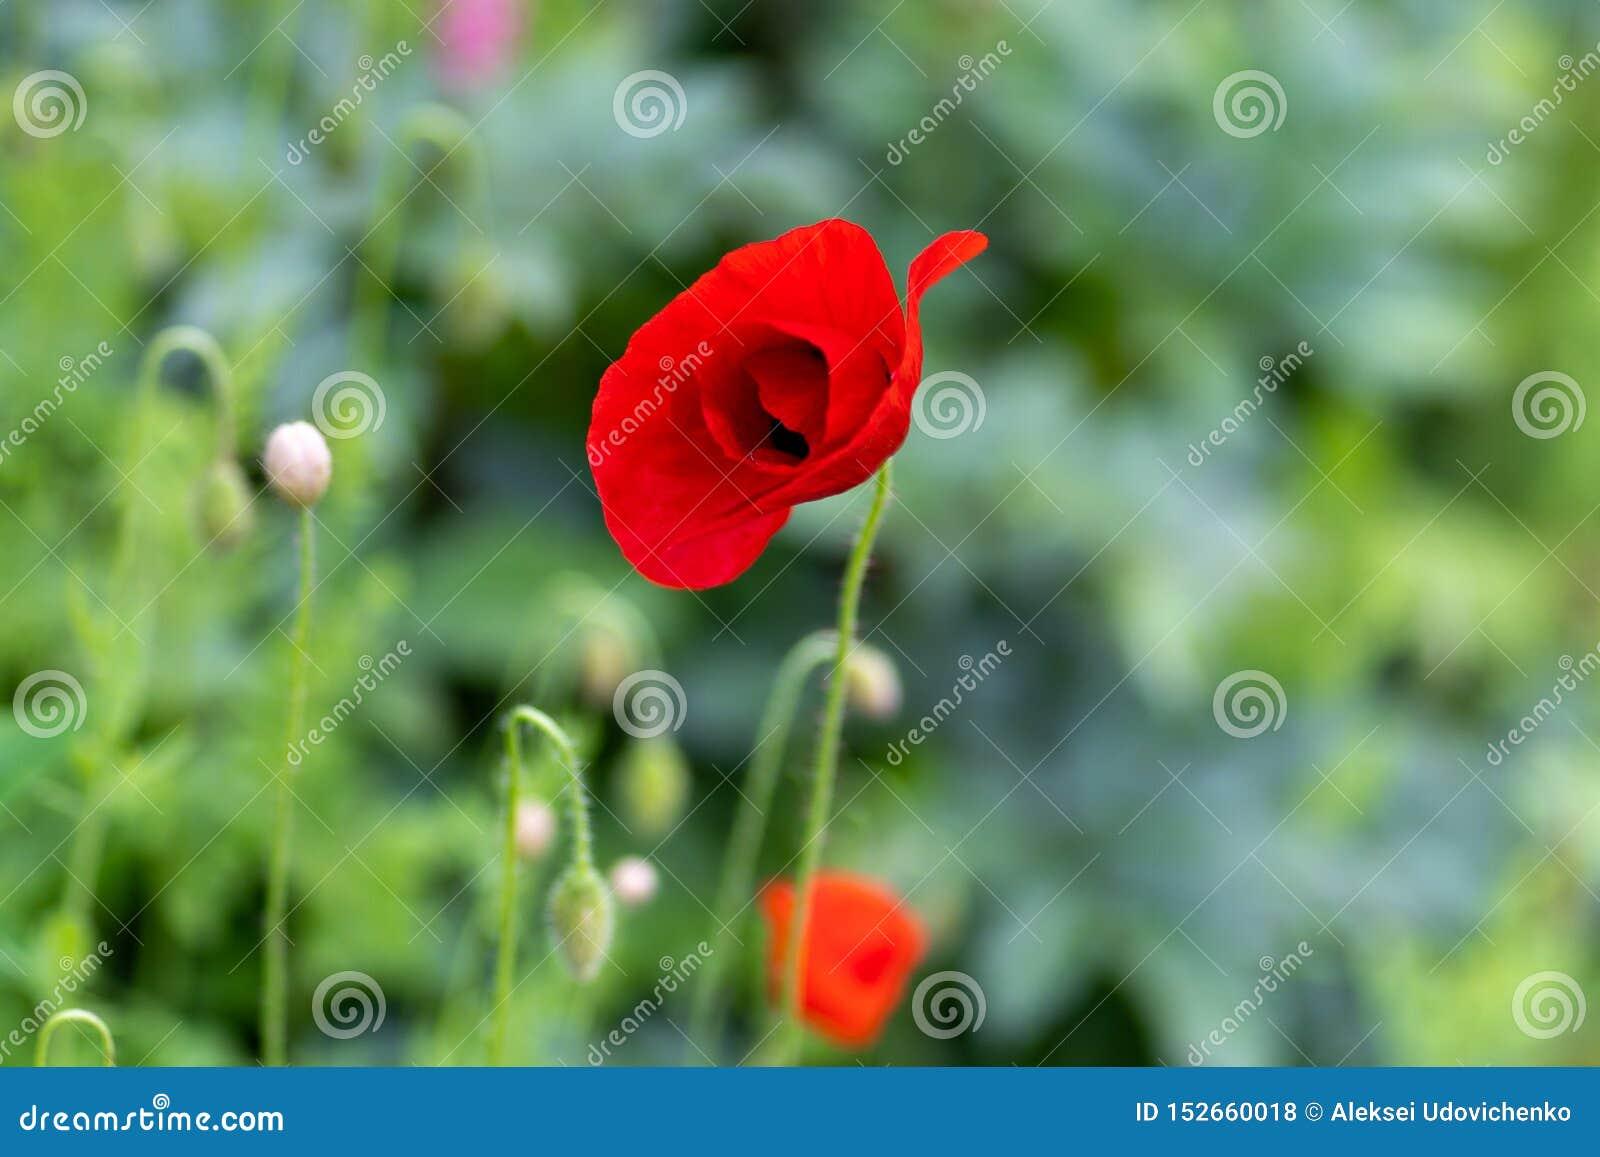 Makro som skjutas av röda blommor mot bakgrunden av gräs i mjuk fokus